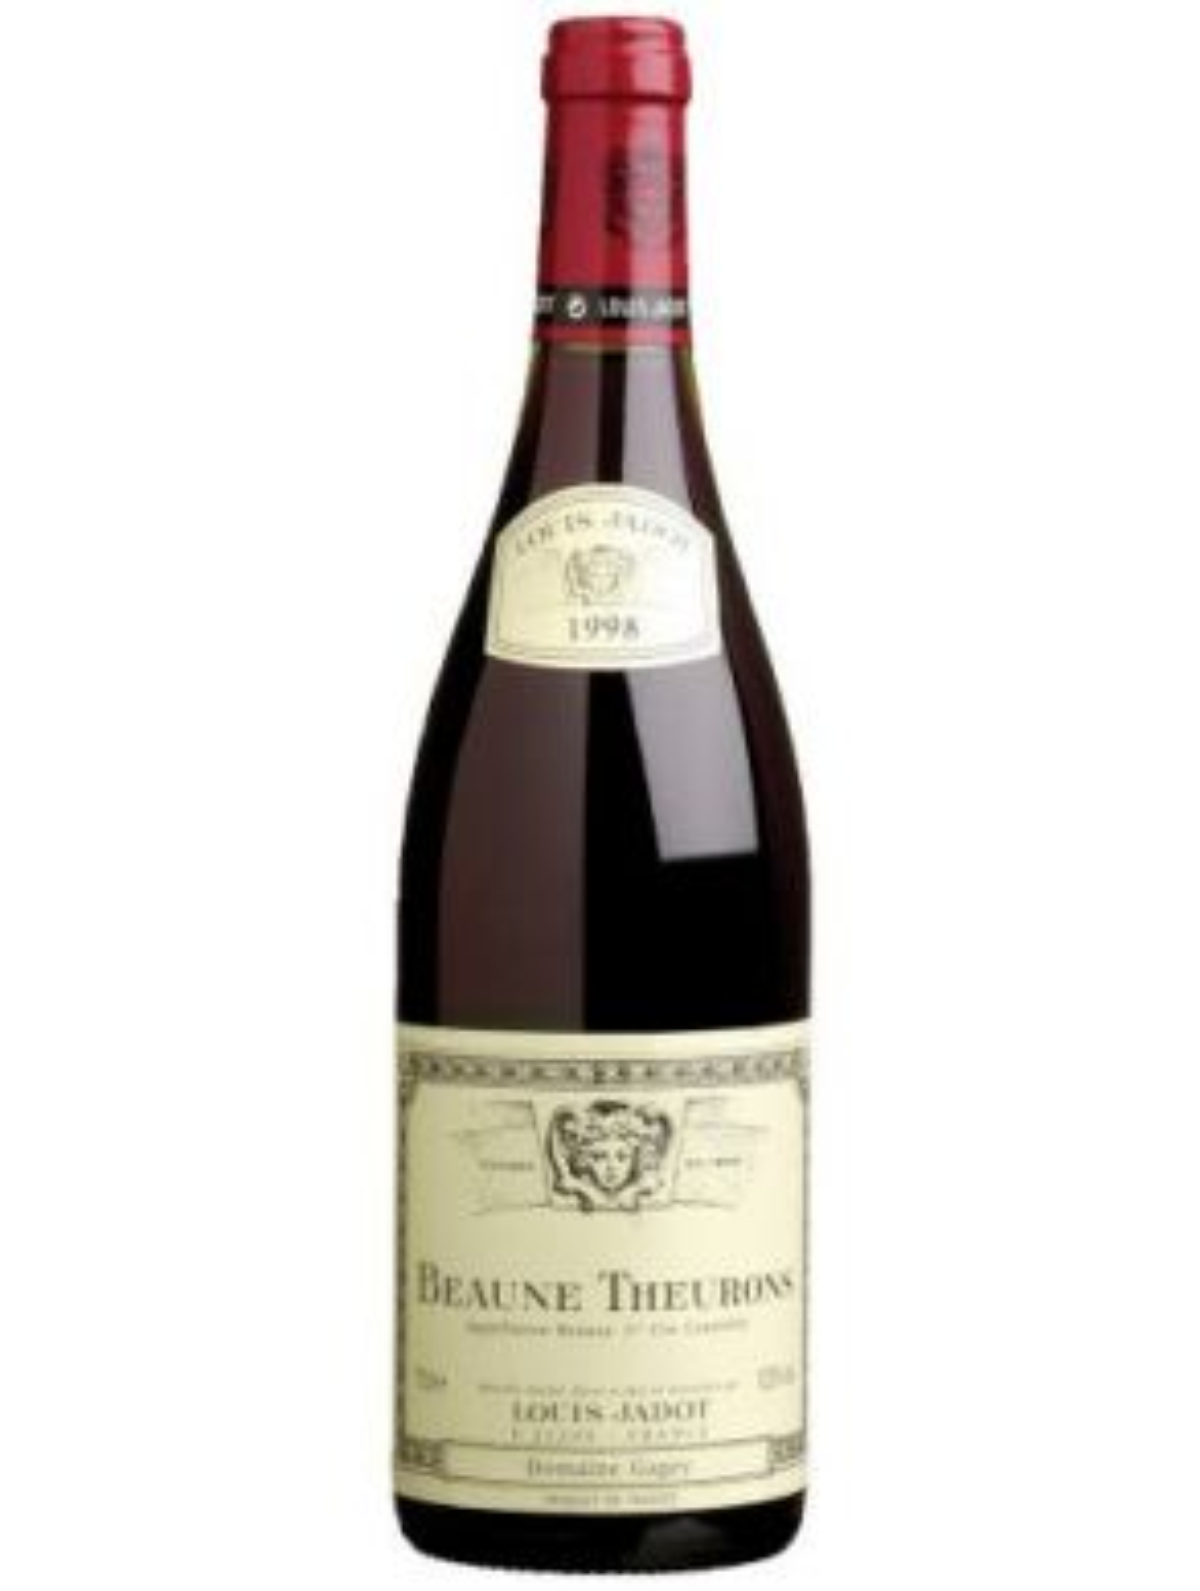 Louis Jadot Beaune 1er Cru Les Theurons 2009 Red Wine Burgundy France